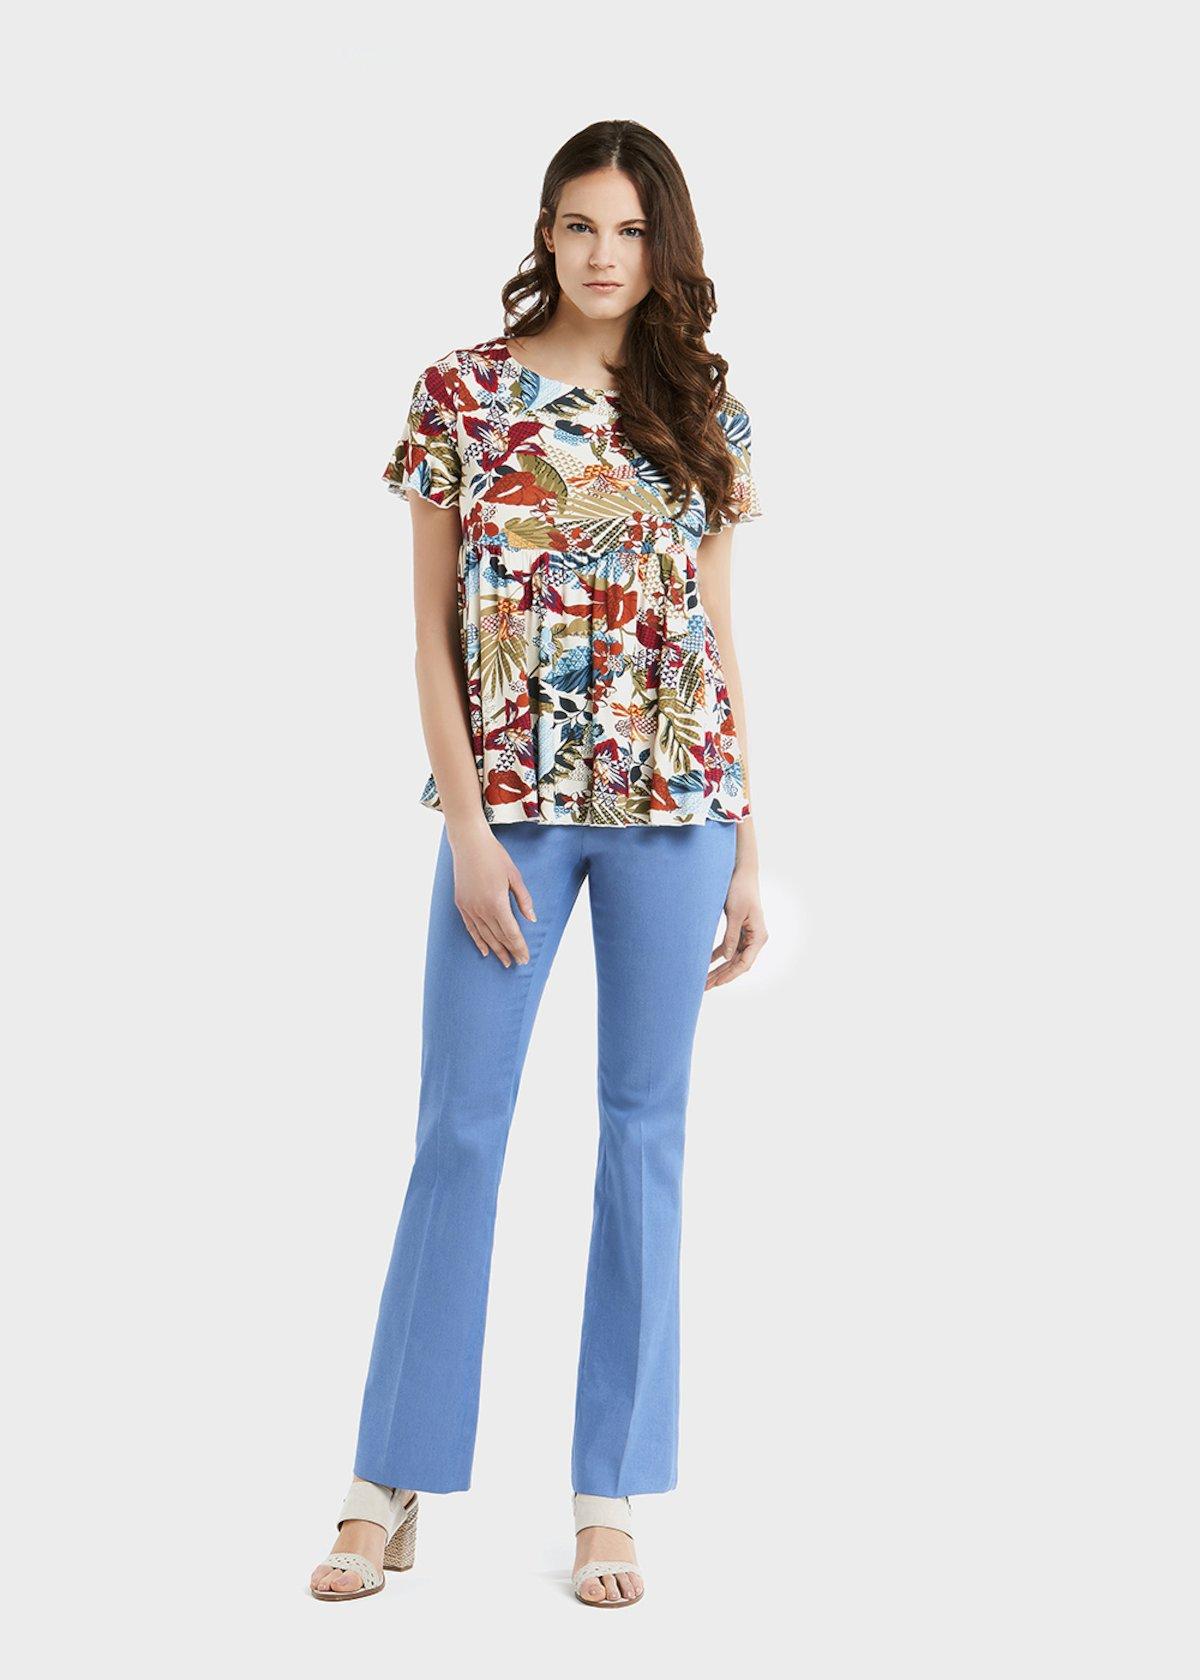 Serafina t-shirt with exotic jungle pattern